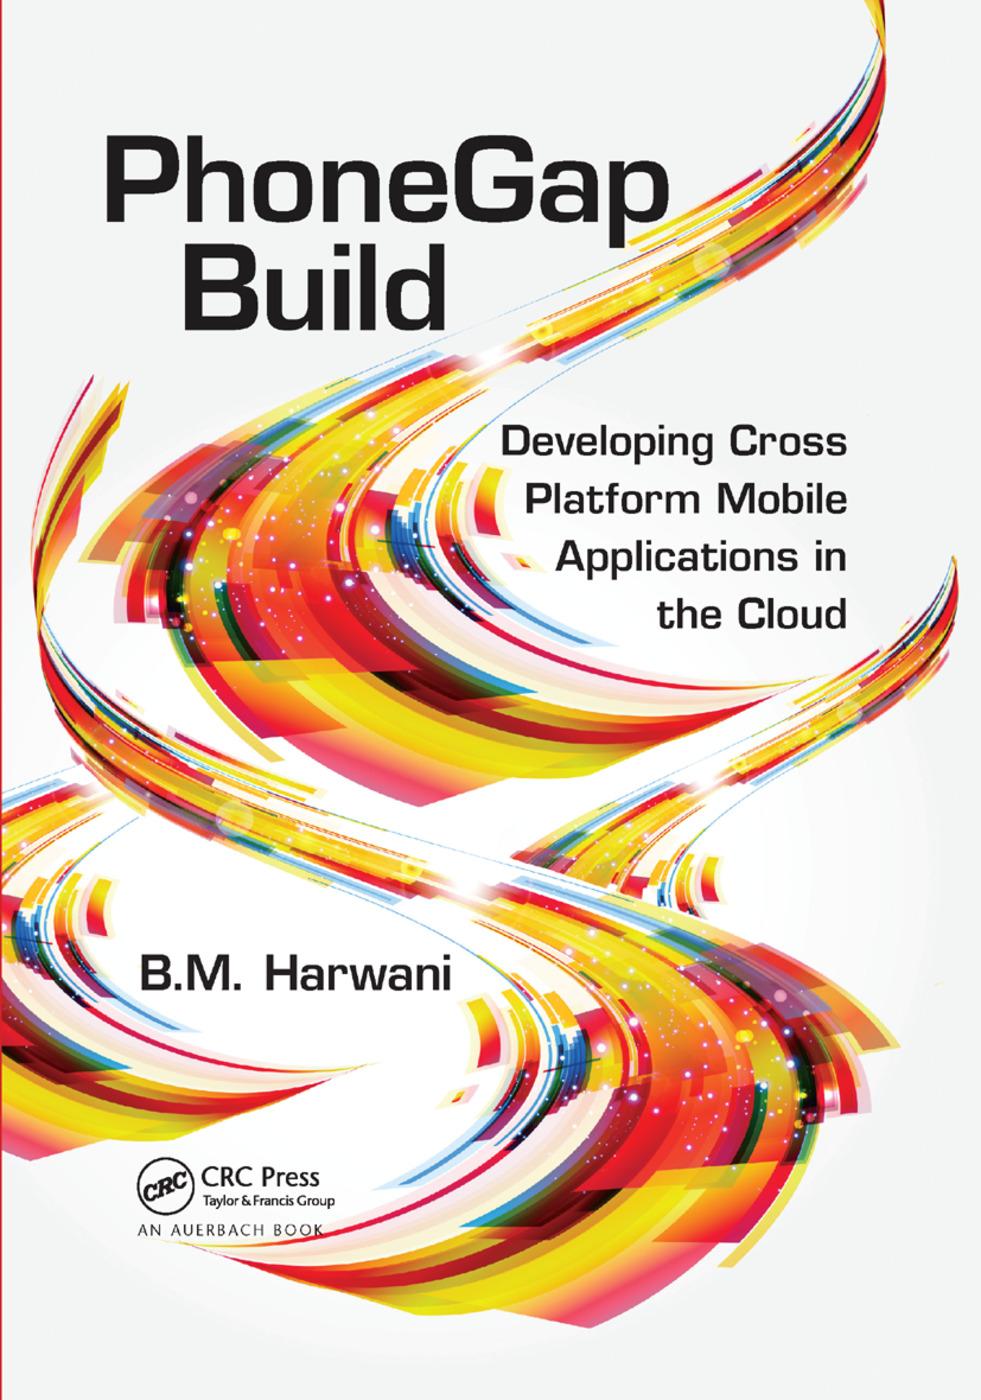 PhoneGap Build